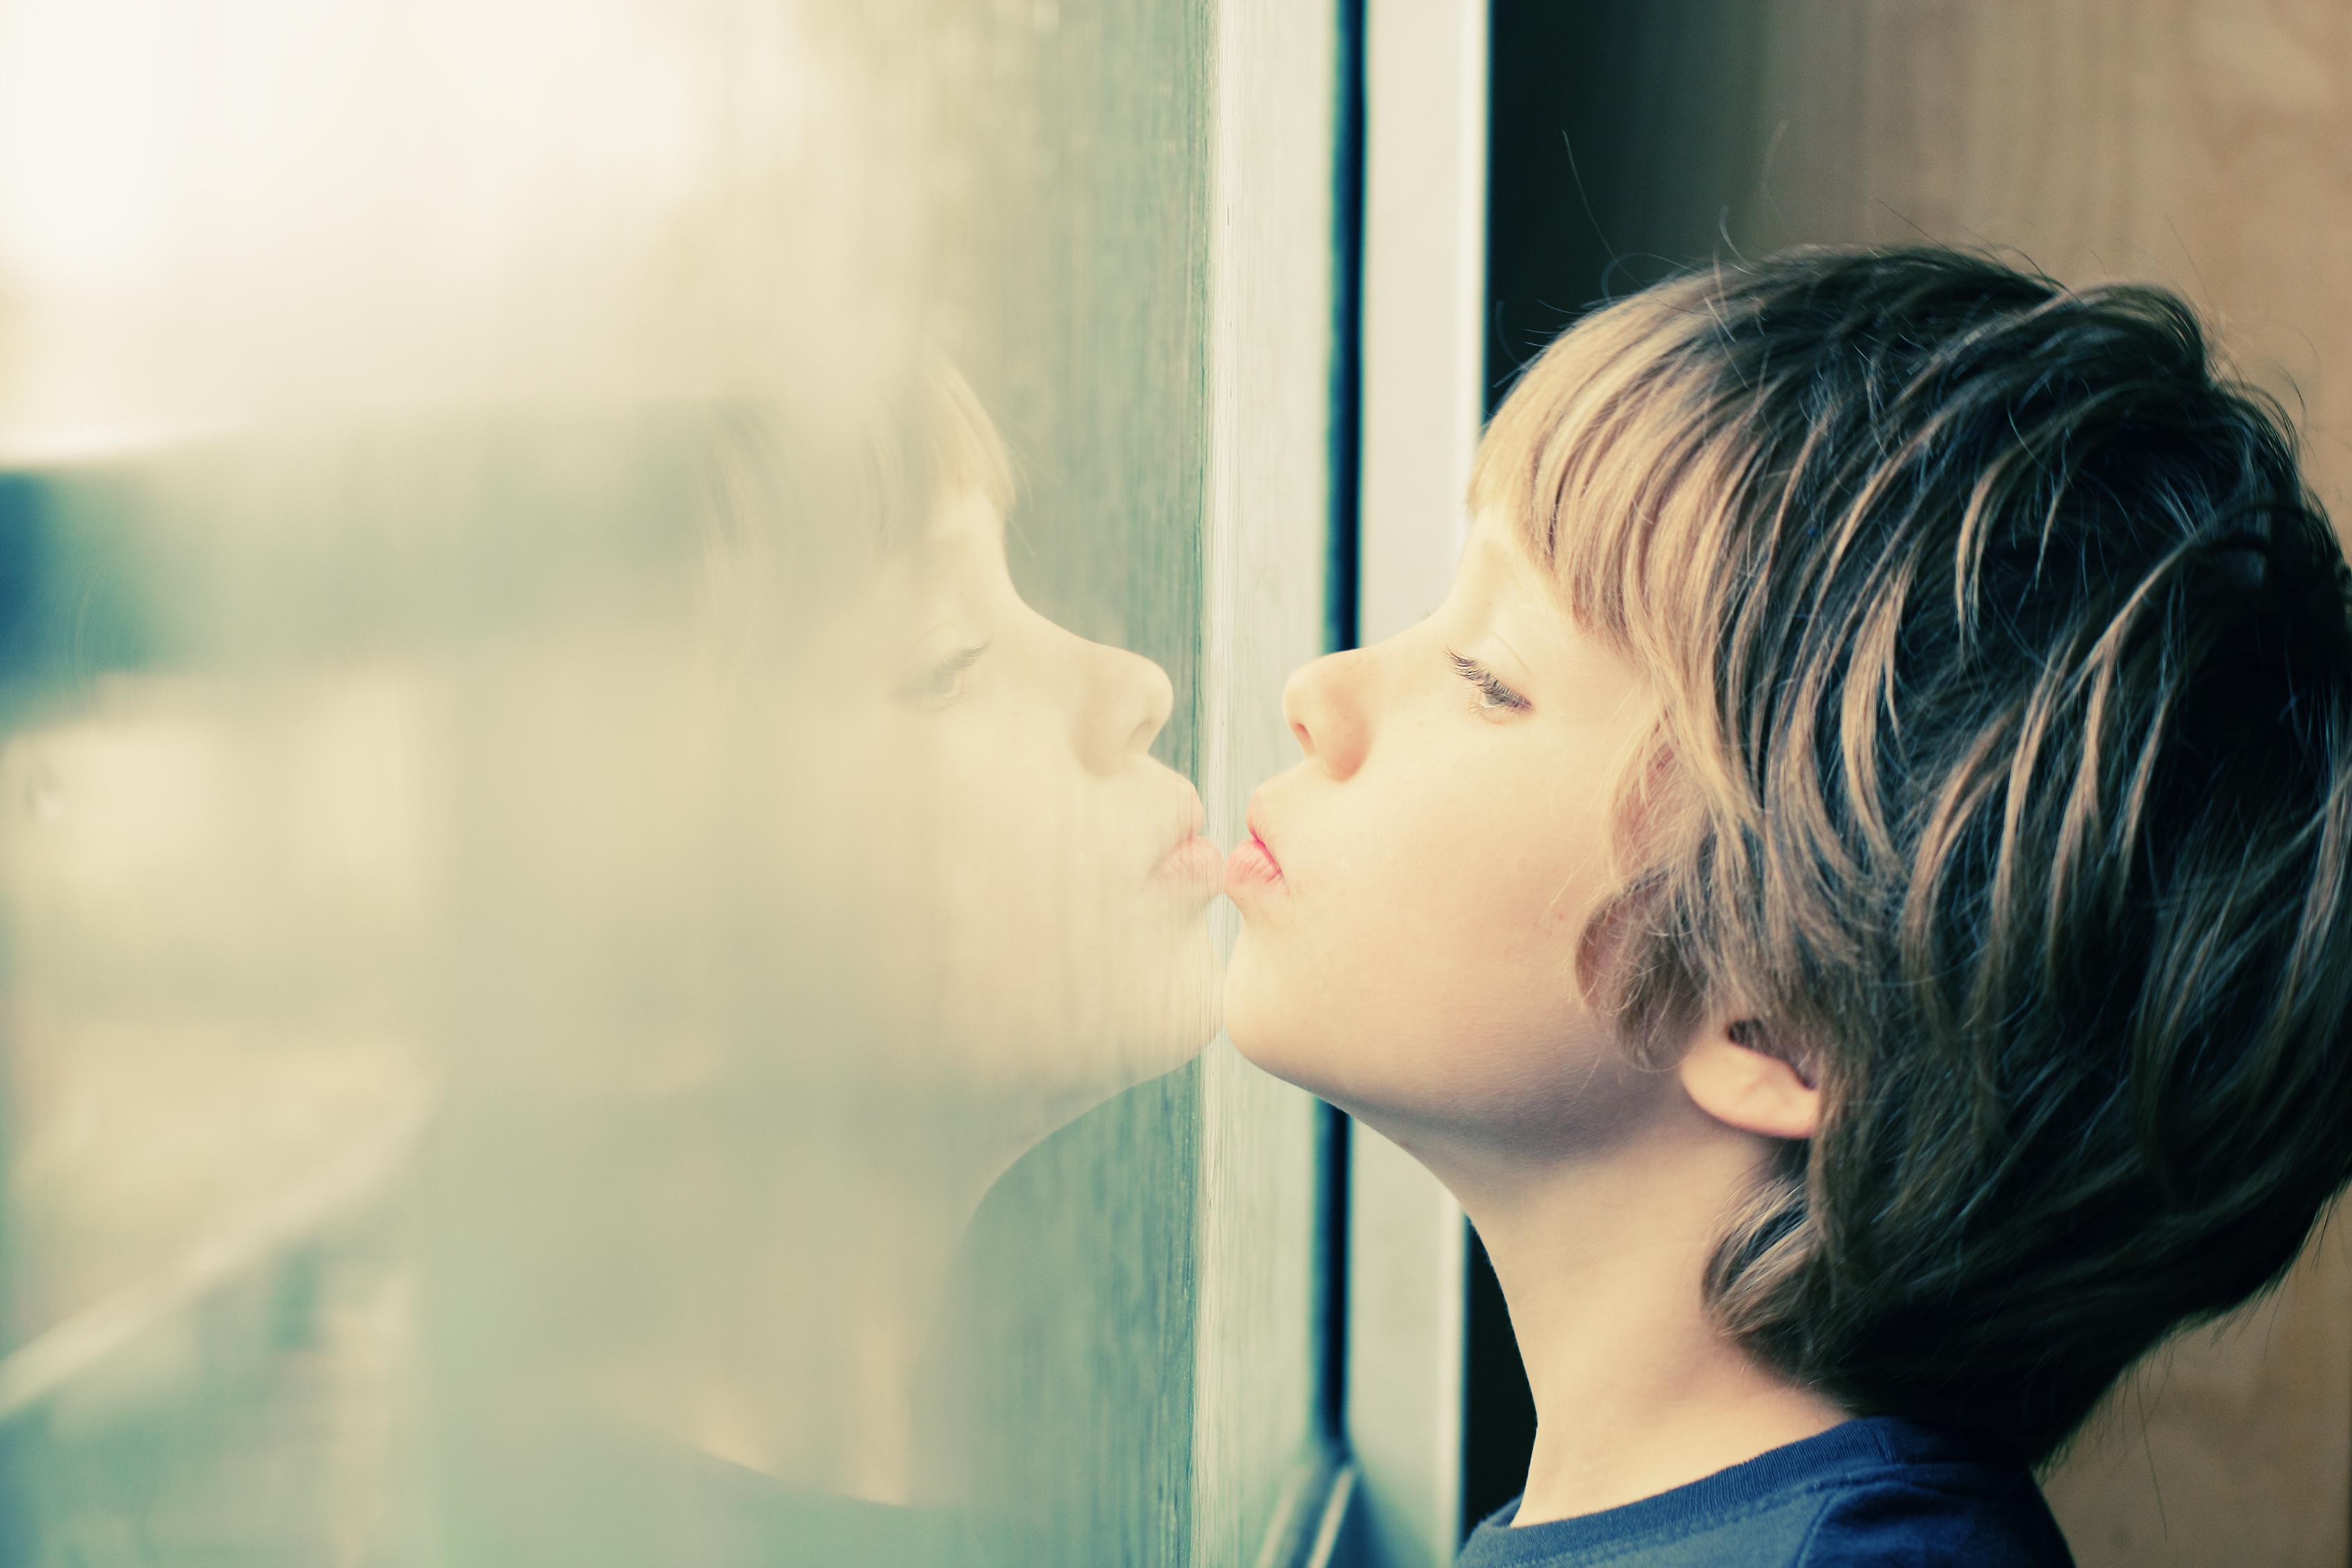 niño con autismo-cannabis-medicinal-cbd-cannabidiol-cannabity